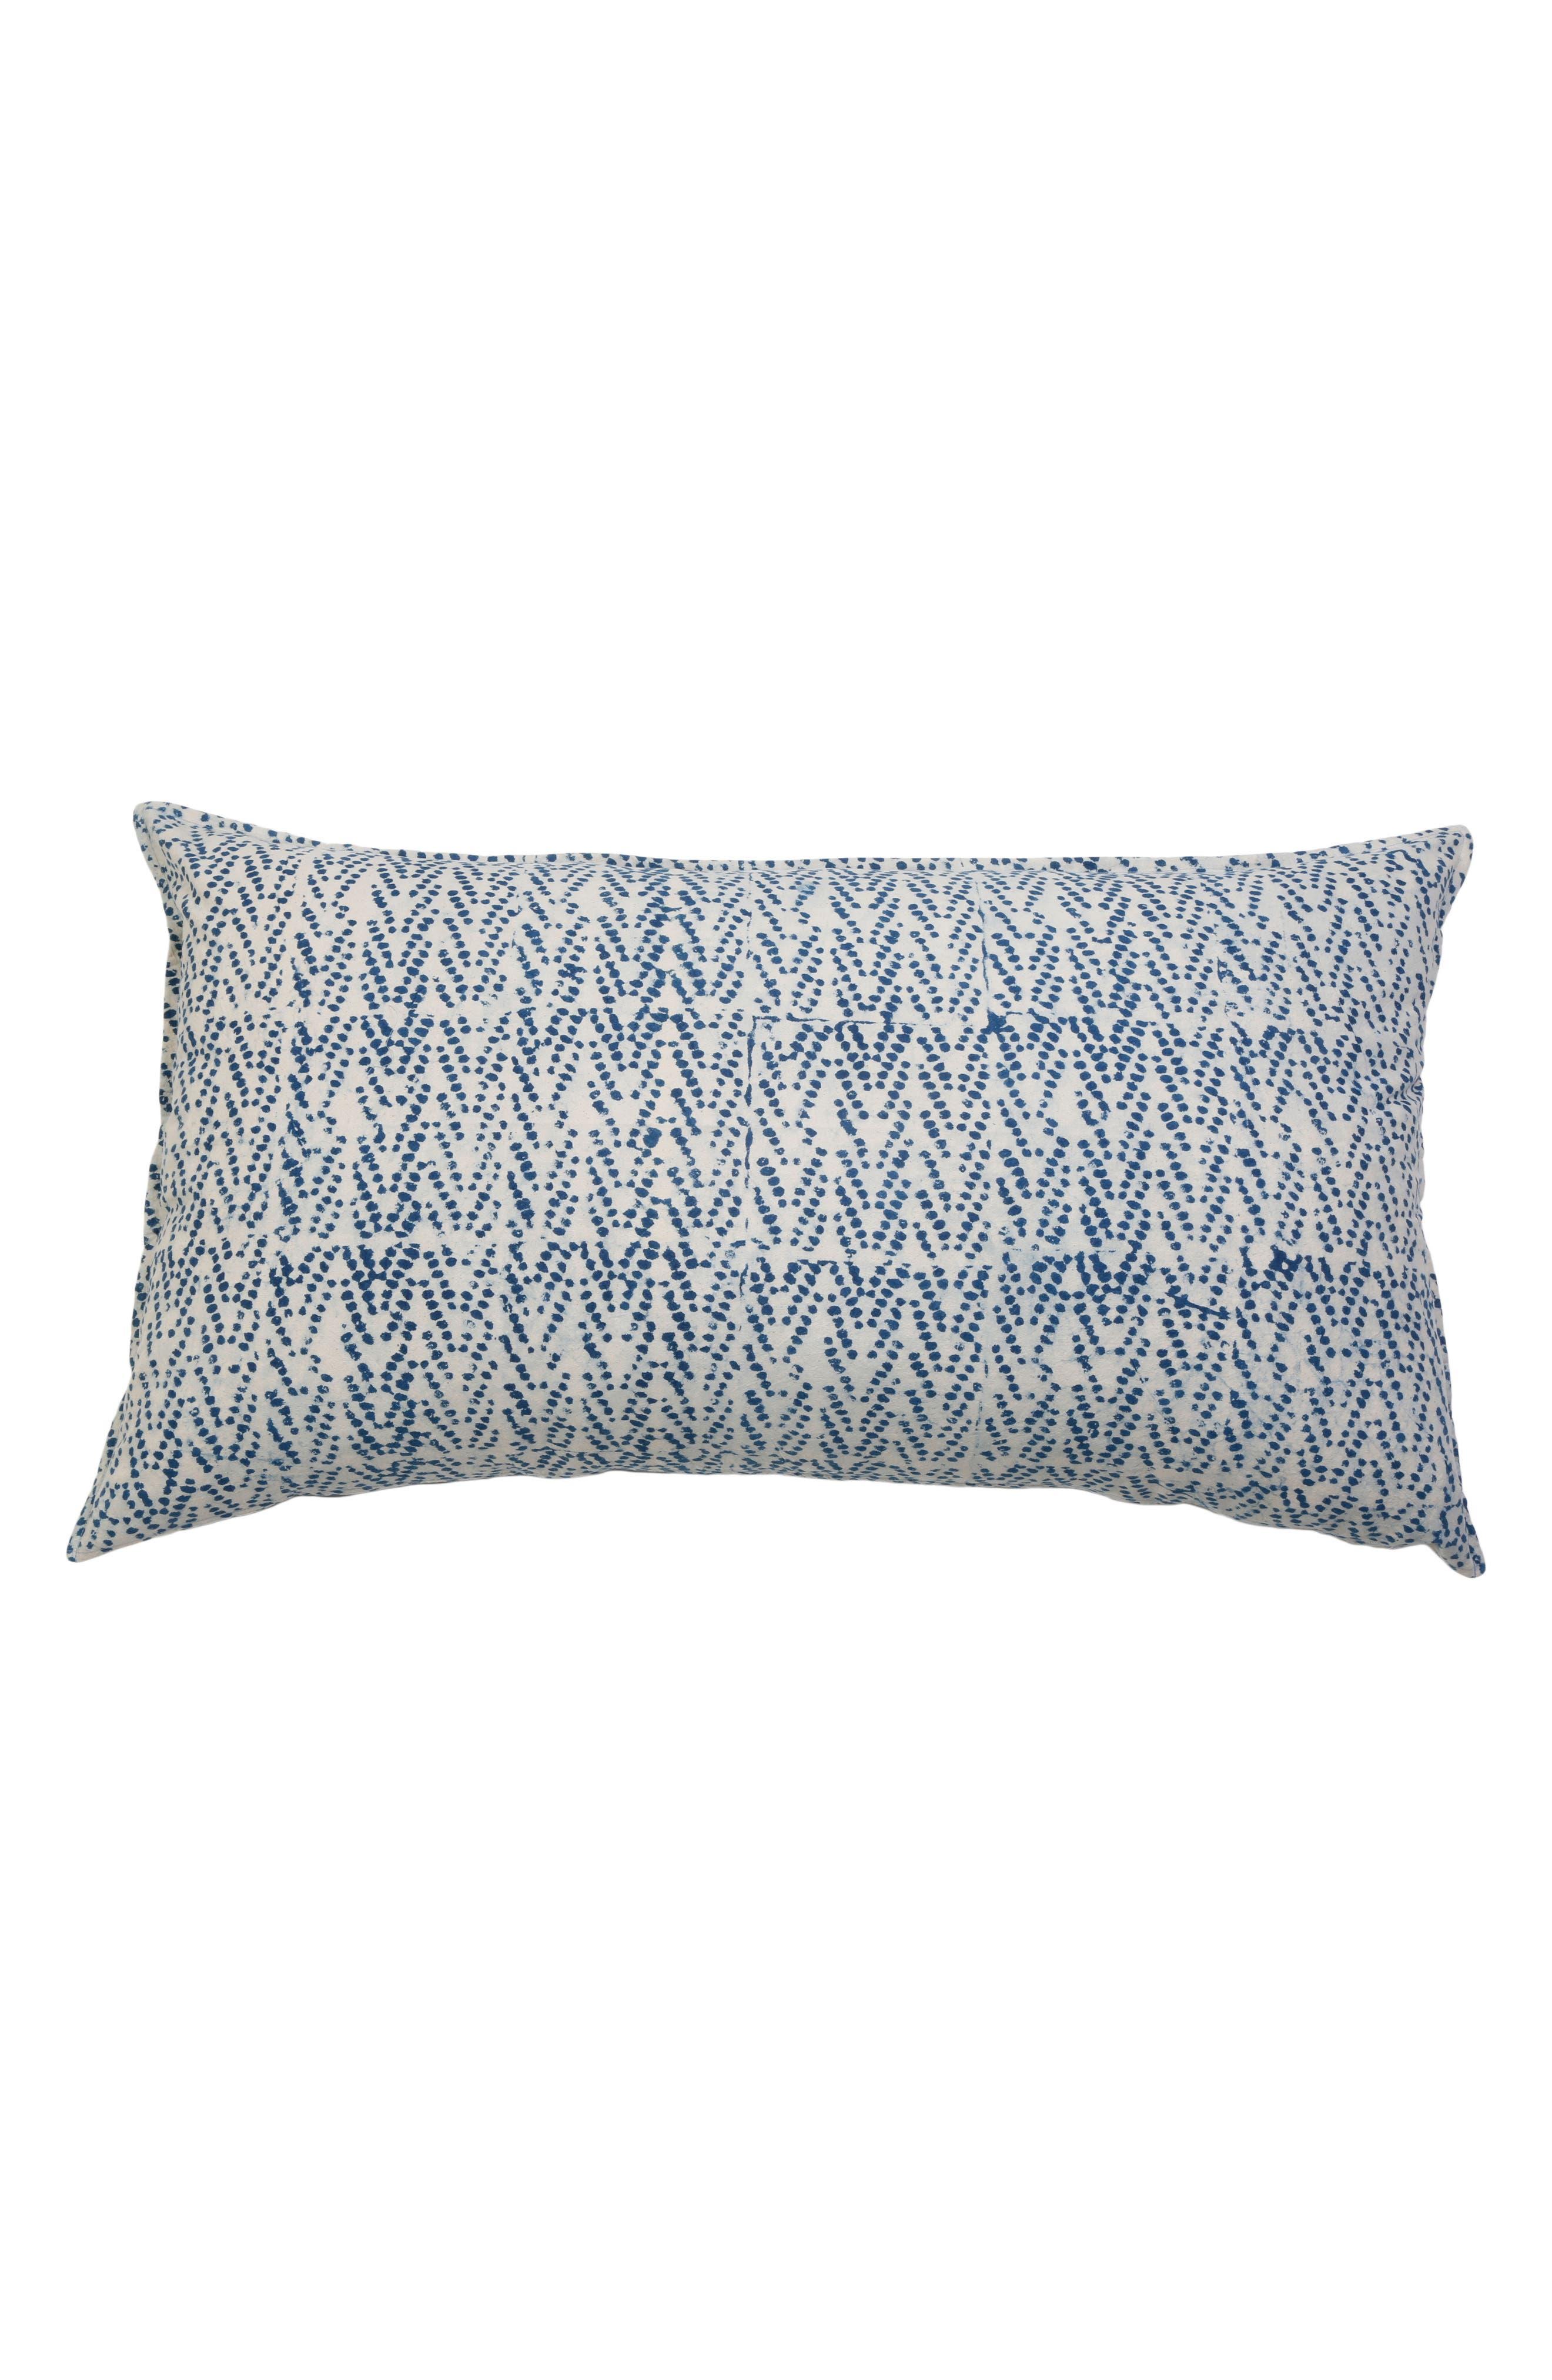 Indigo Dots Accent Pillow,                             Main thumbnail 1, color,                             Blue Multi